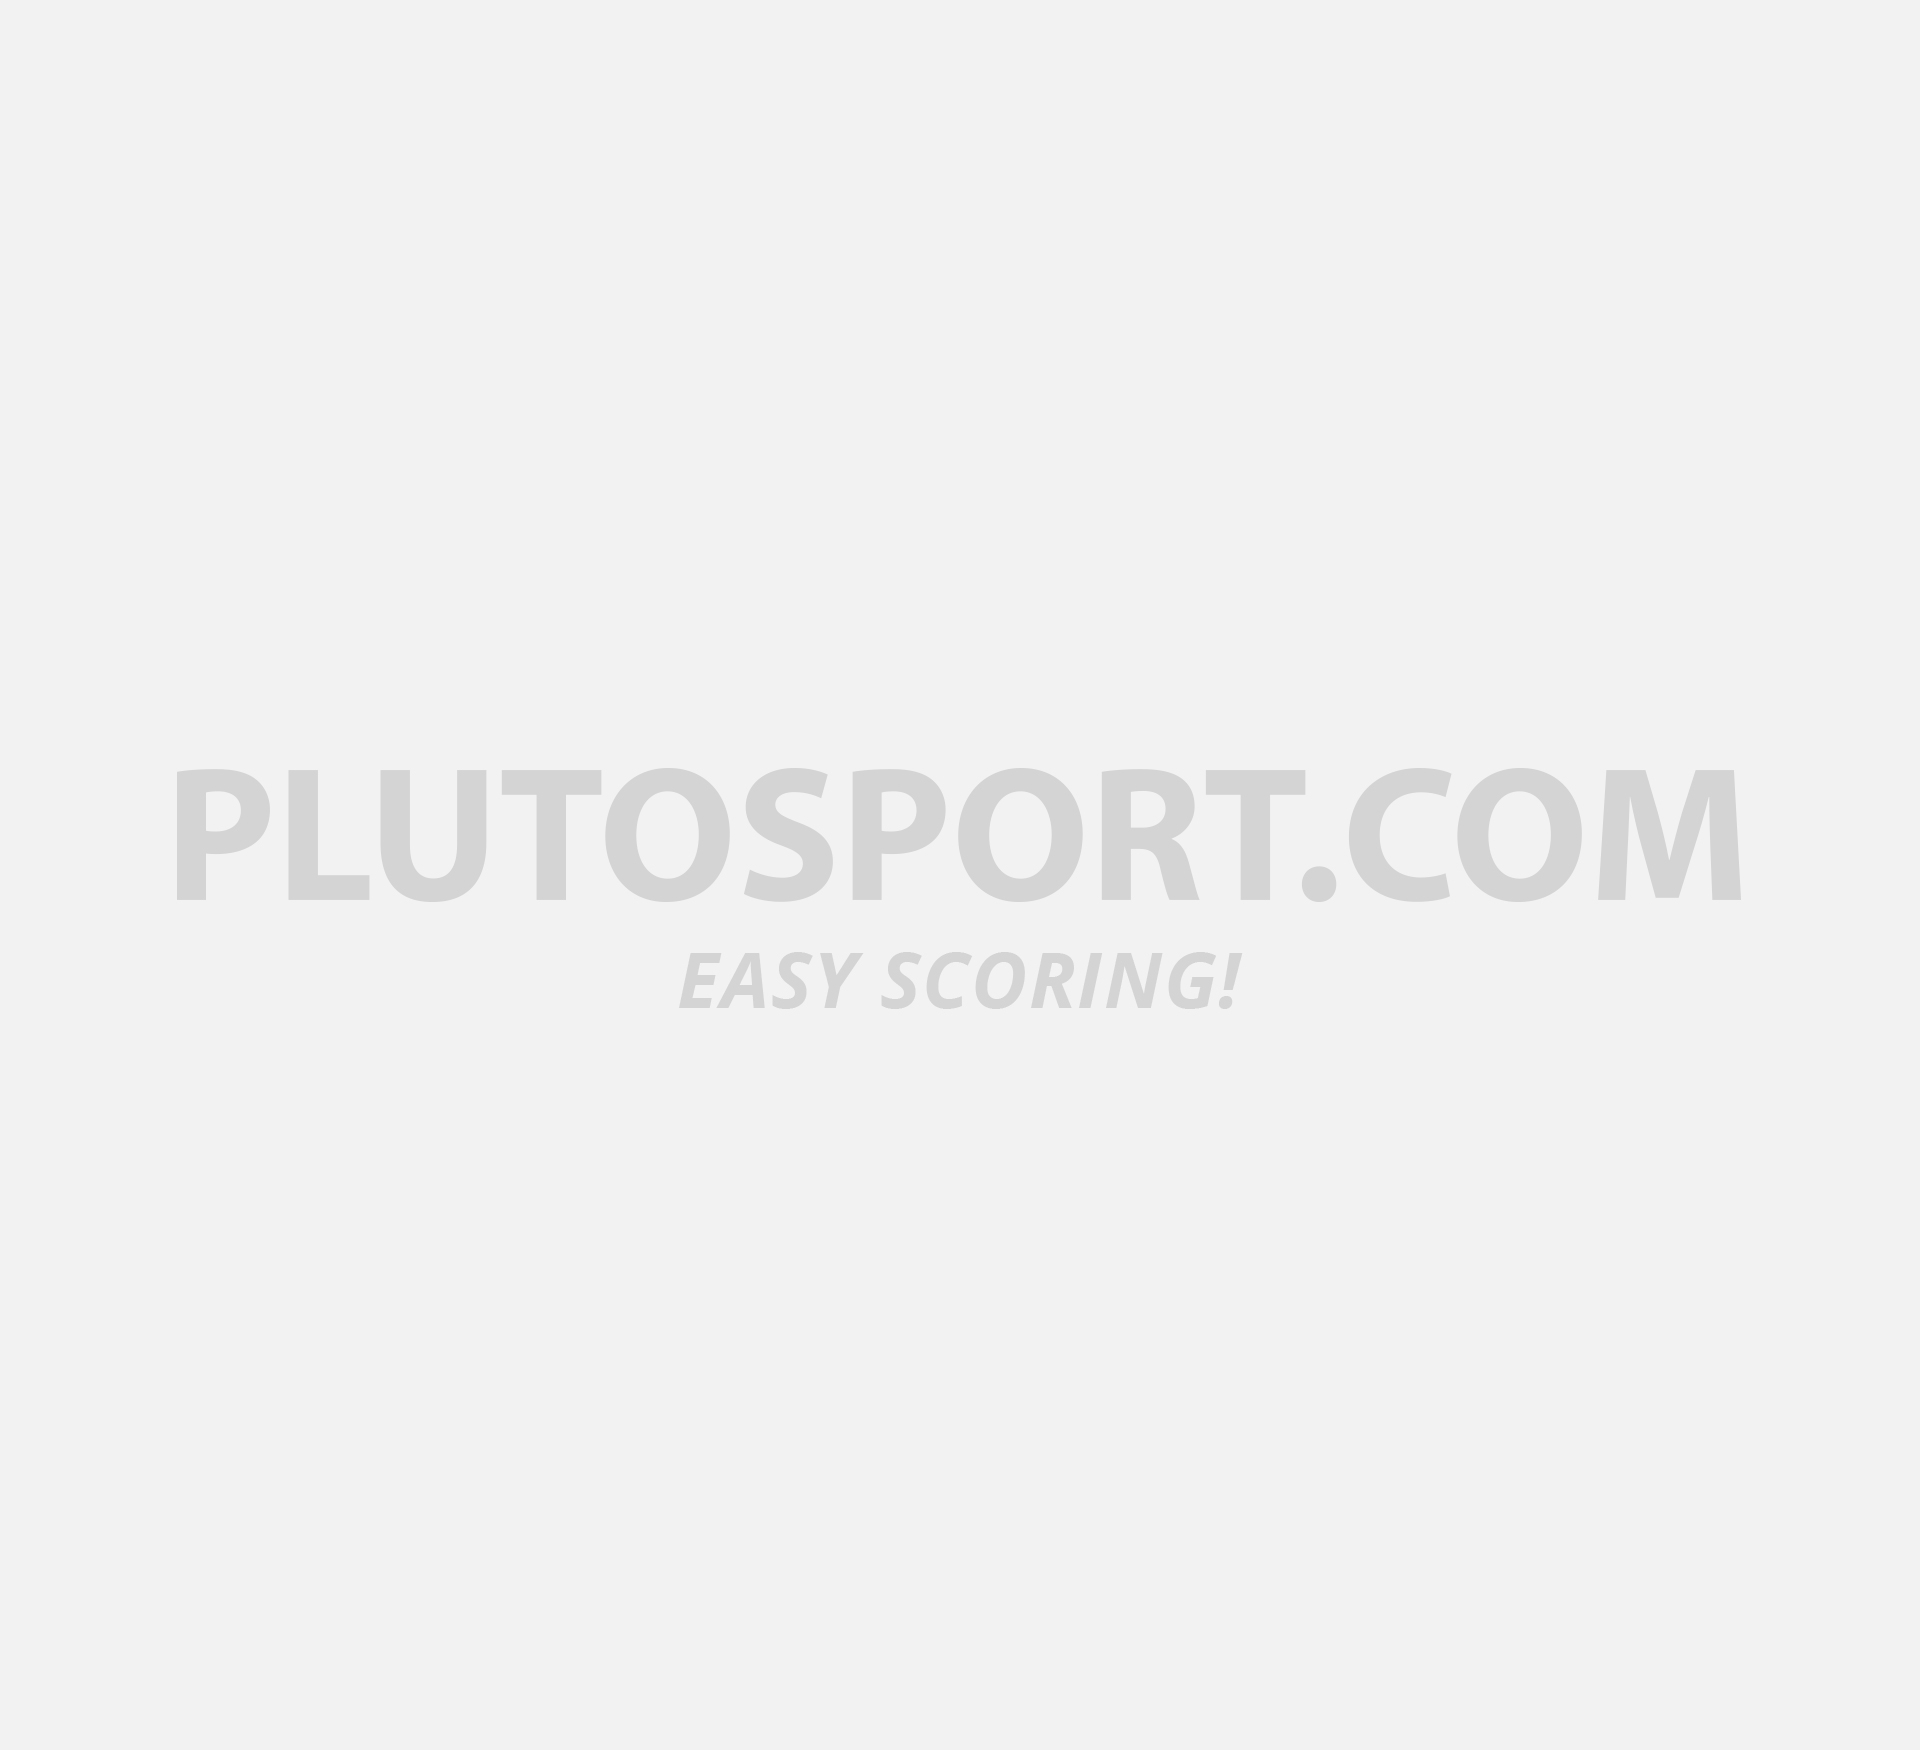 e0c667b1 Asics Performance Pack - Gloves - Accessories - Running - Men | Plutosport